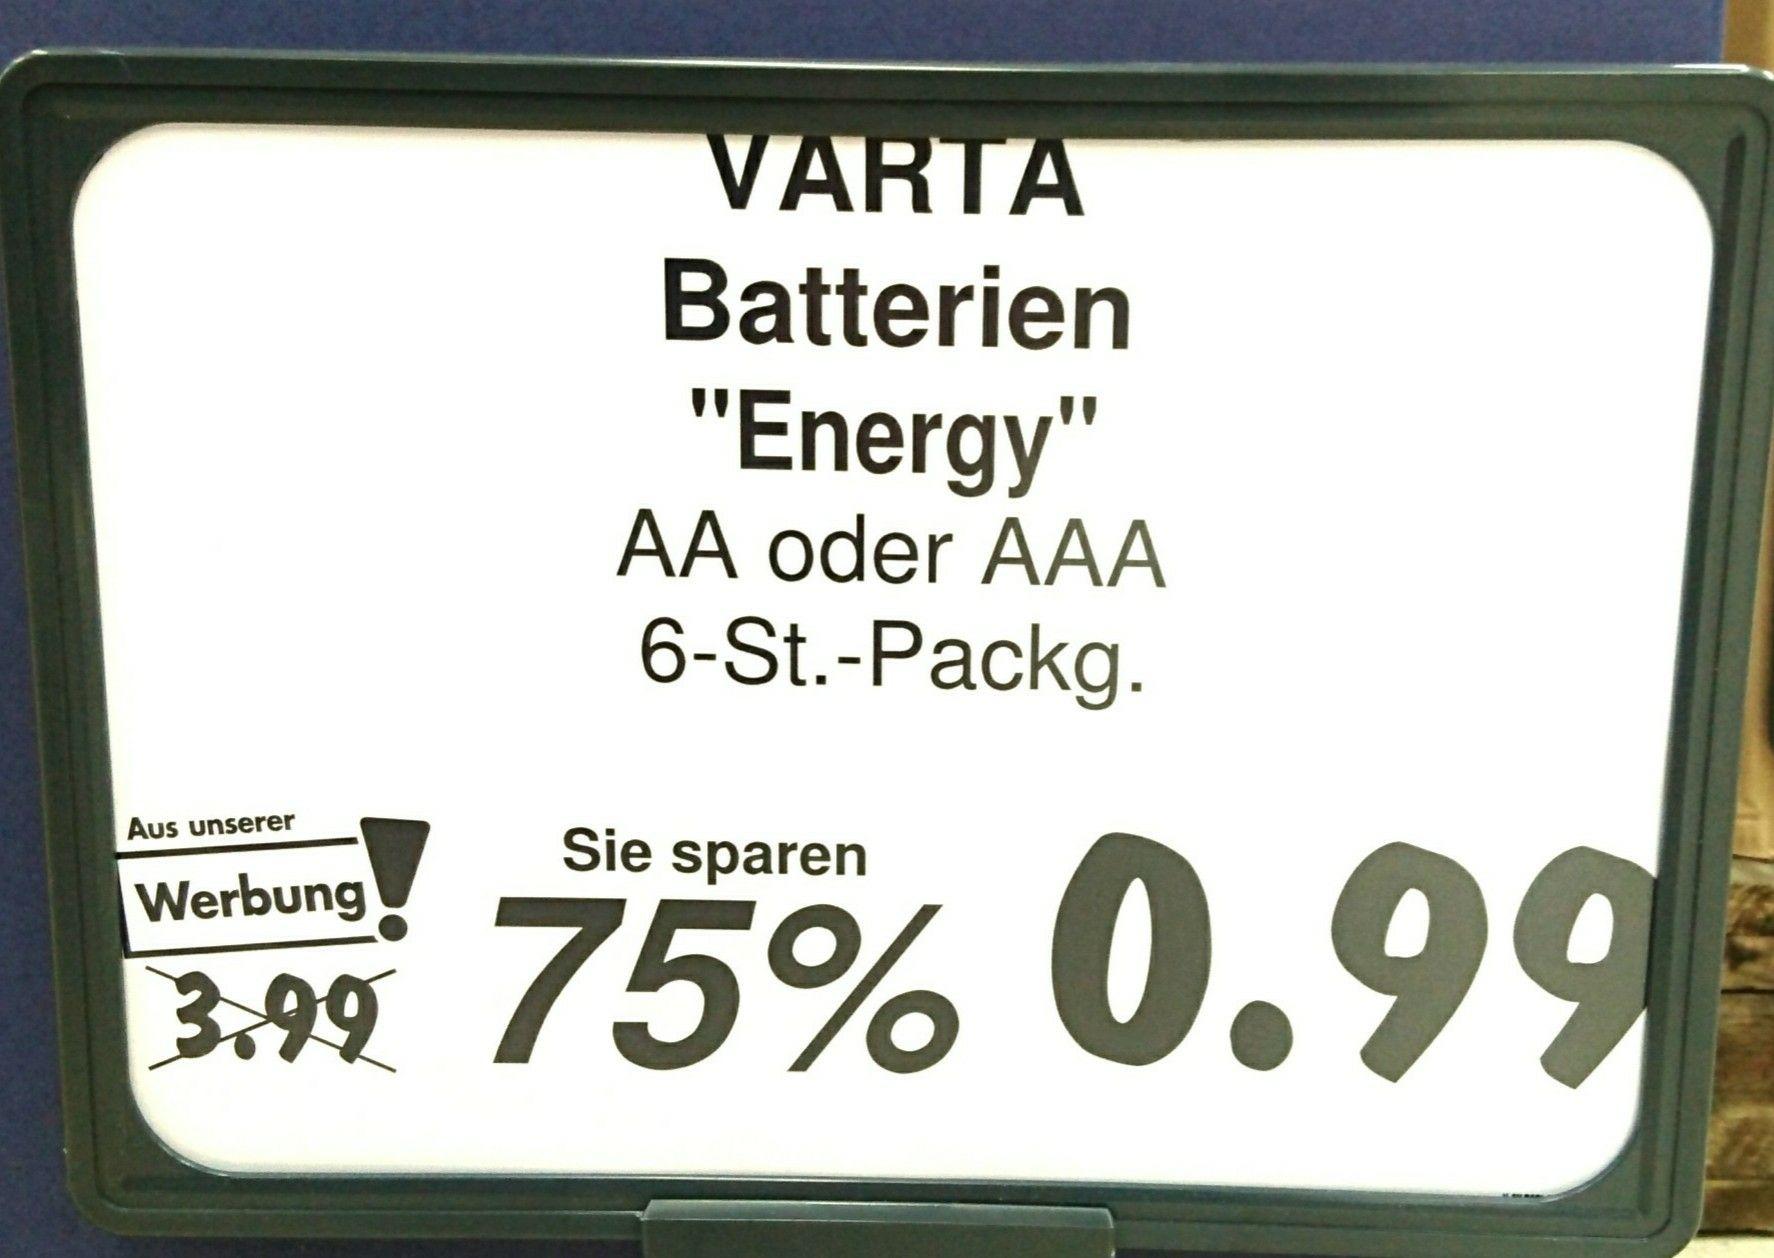 Varta Energy Batterien AAA oder AA im 6er-Pack für 0,99€ im Kaufland Coesfeld